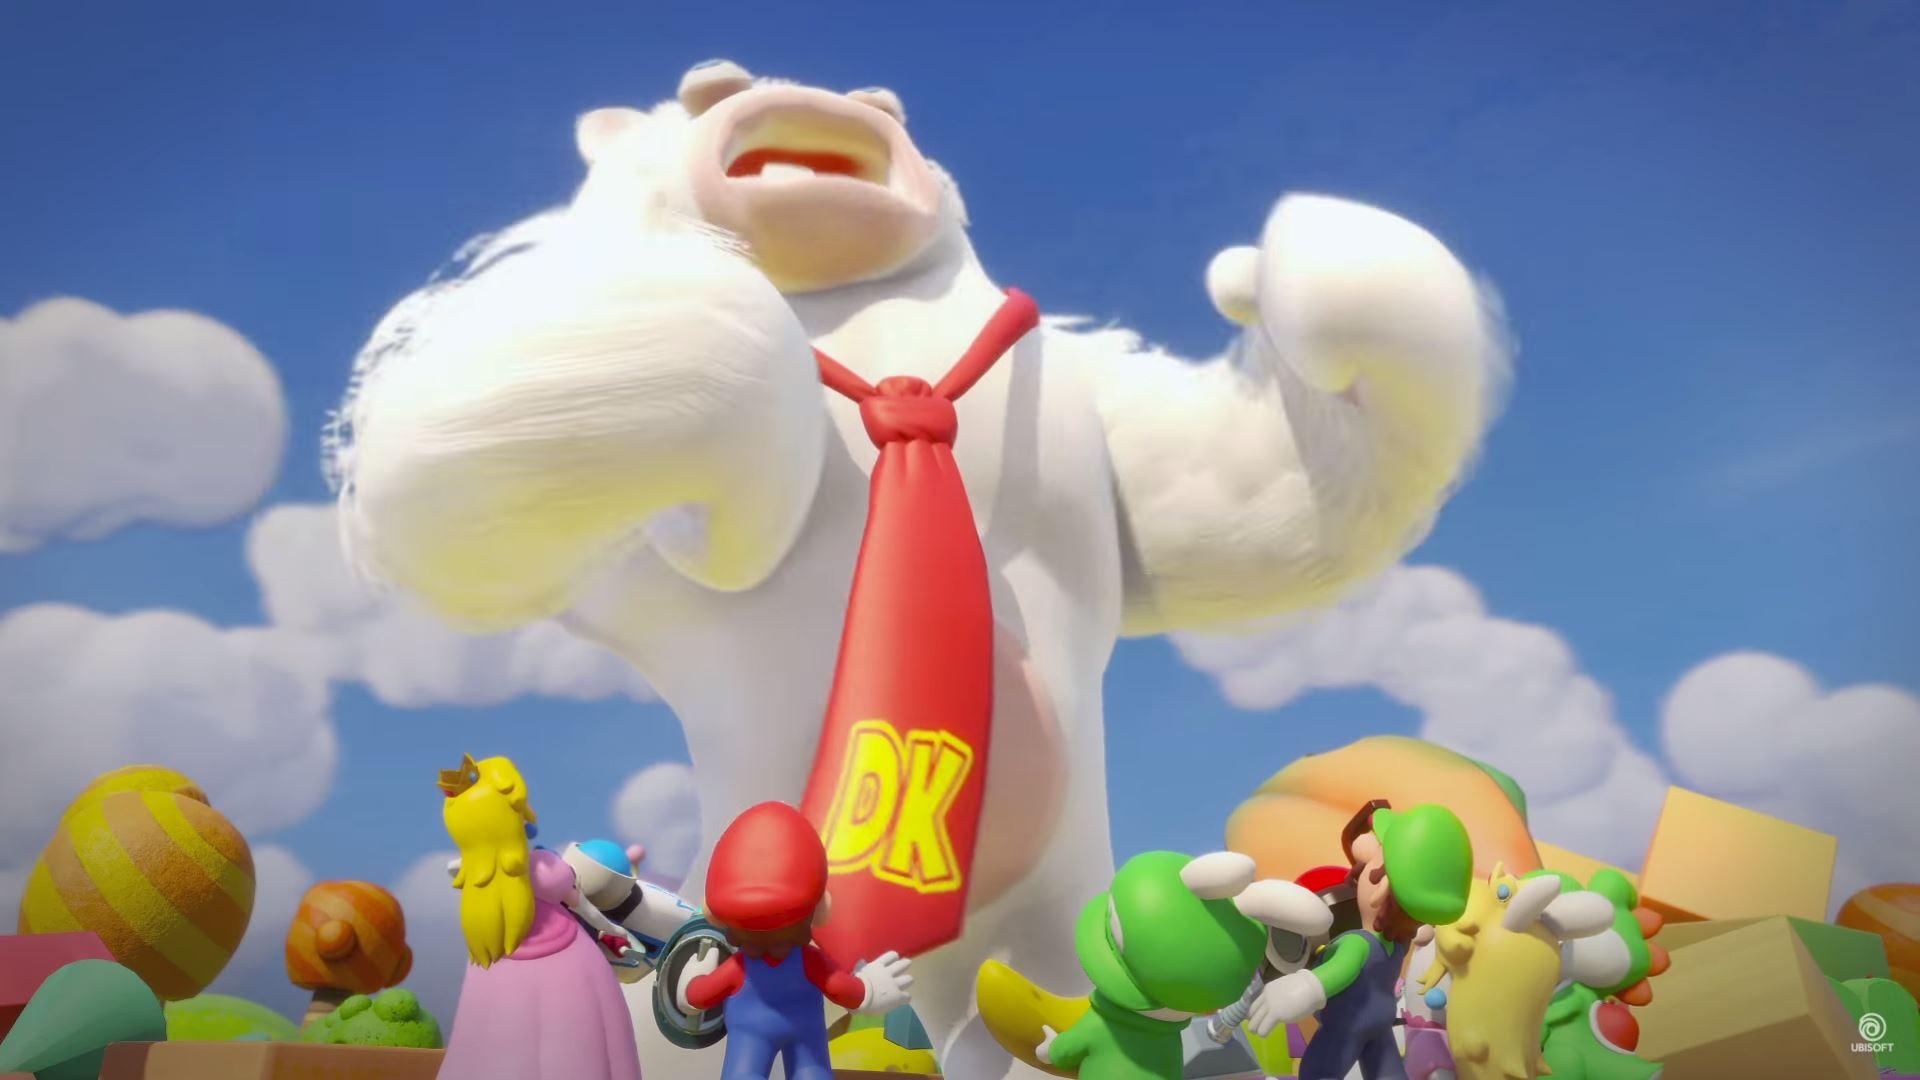 Mario + Rabbids Kingdom Battle DK